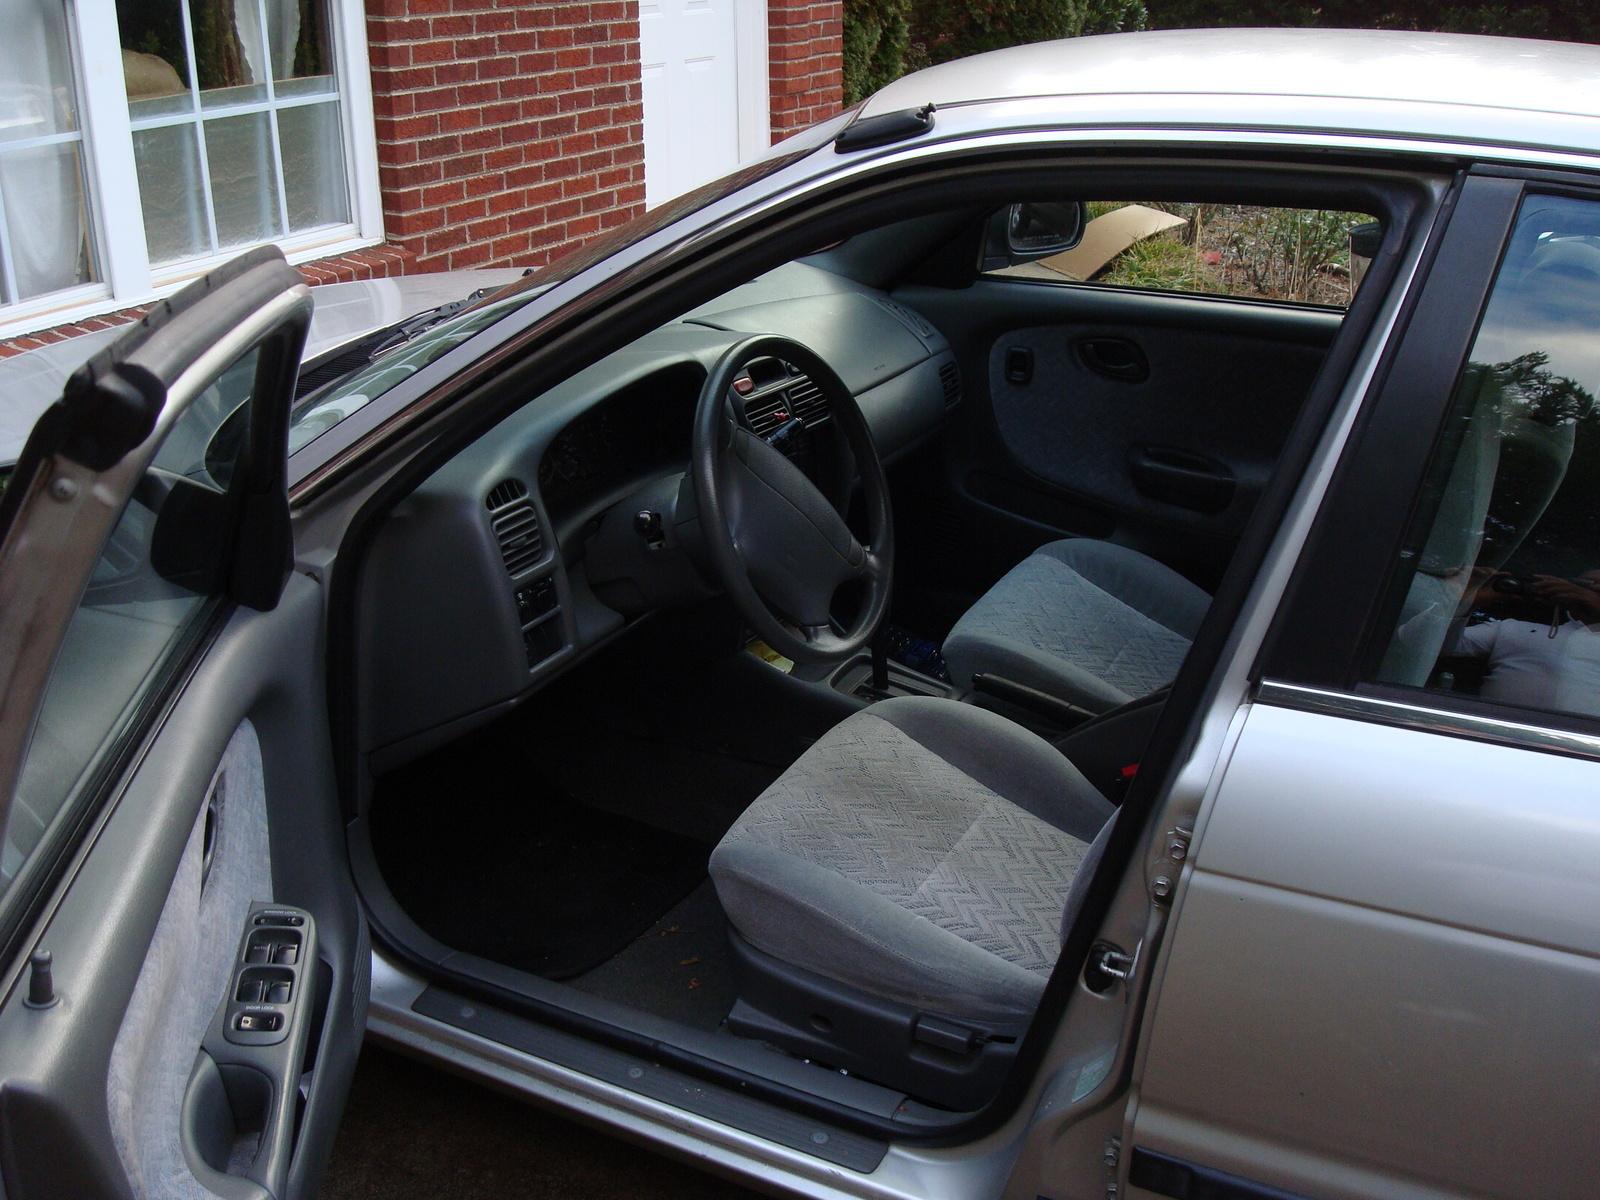 1996 Suzuki Esteem Glx Related Infomationspecifications Weili 98 Wiring Diagram 2000 4 Dr Sedan Picture Interior